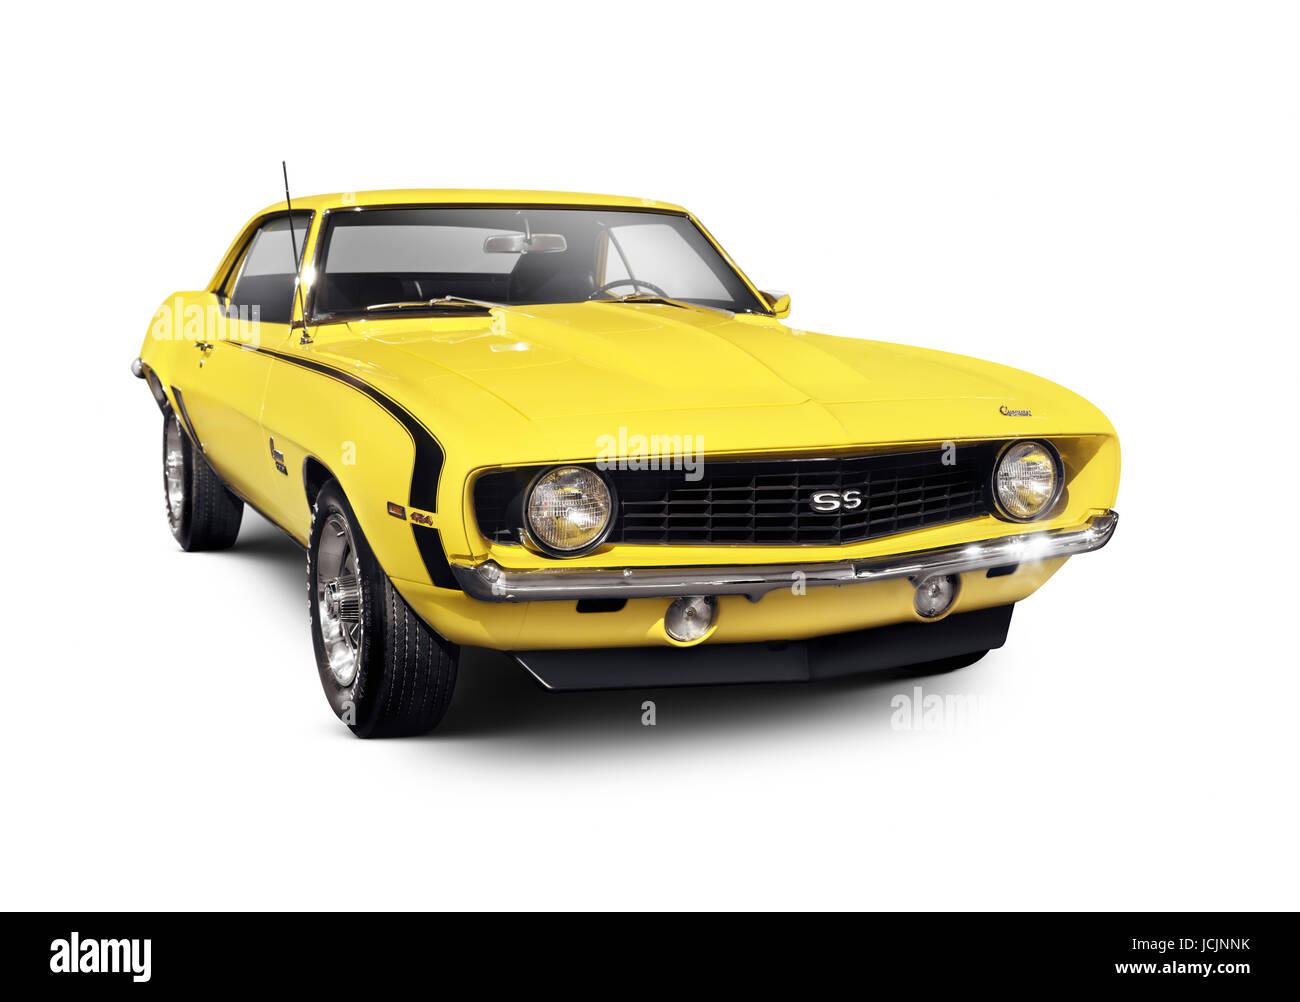 Yellow 1969 Chevrolet Camaro Ss Classic Retro Sports Car Muscle Car